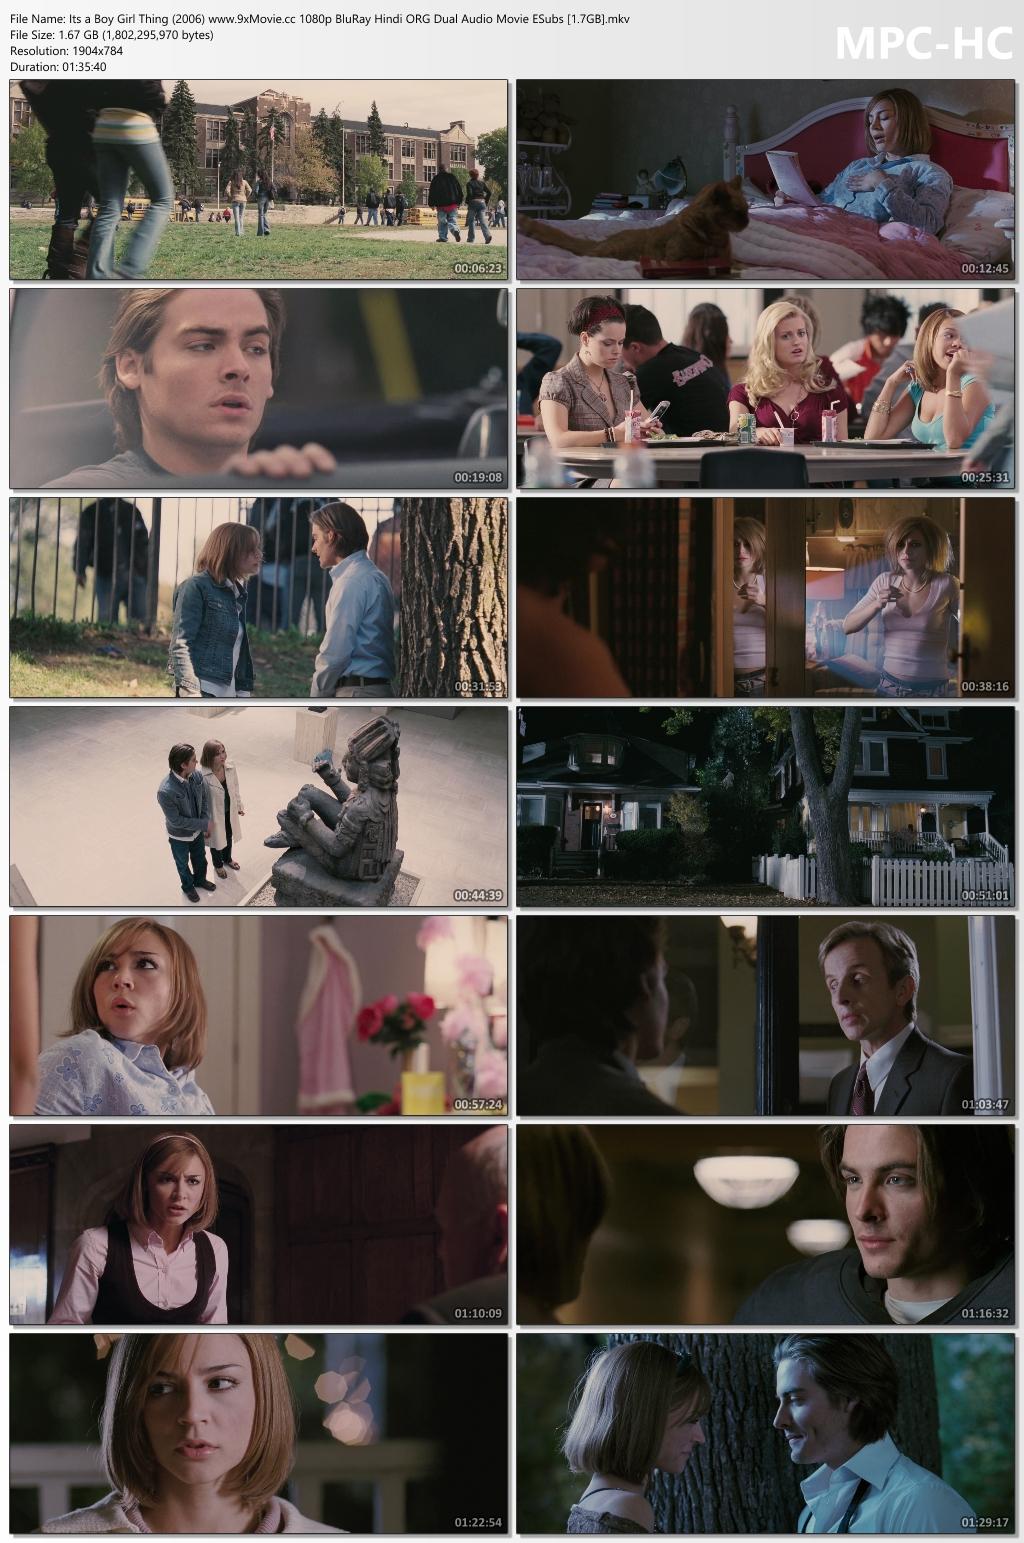 Its-a-Boy-Girl-Thing-2006-www-9x-Movie-cc-1080p-Blu-Ray-Hindi-ORG-Dual-Audio-Movie-ESubs-1-7-GB-mkv